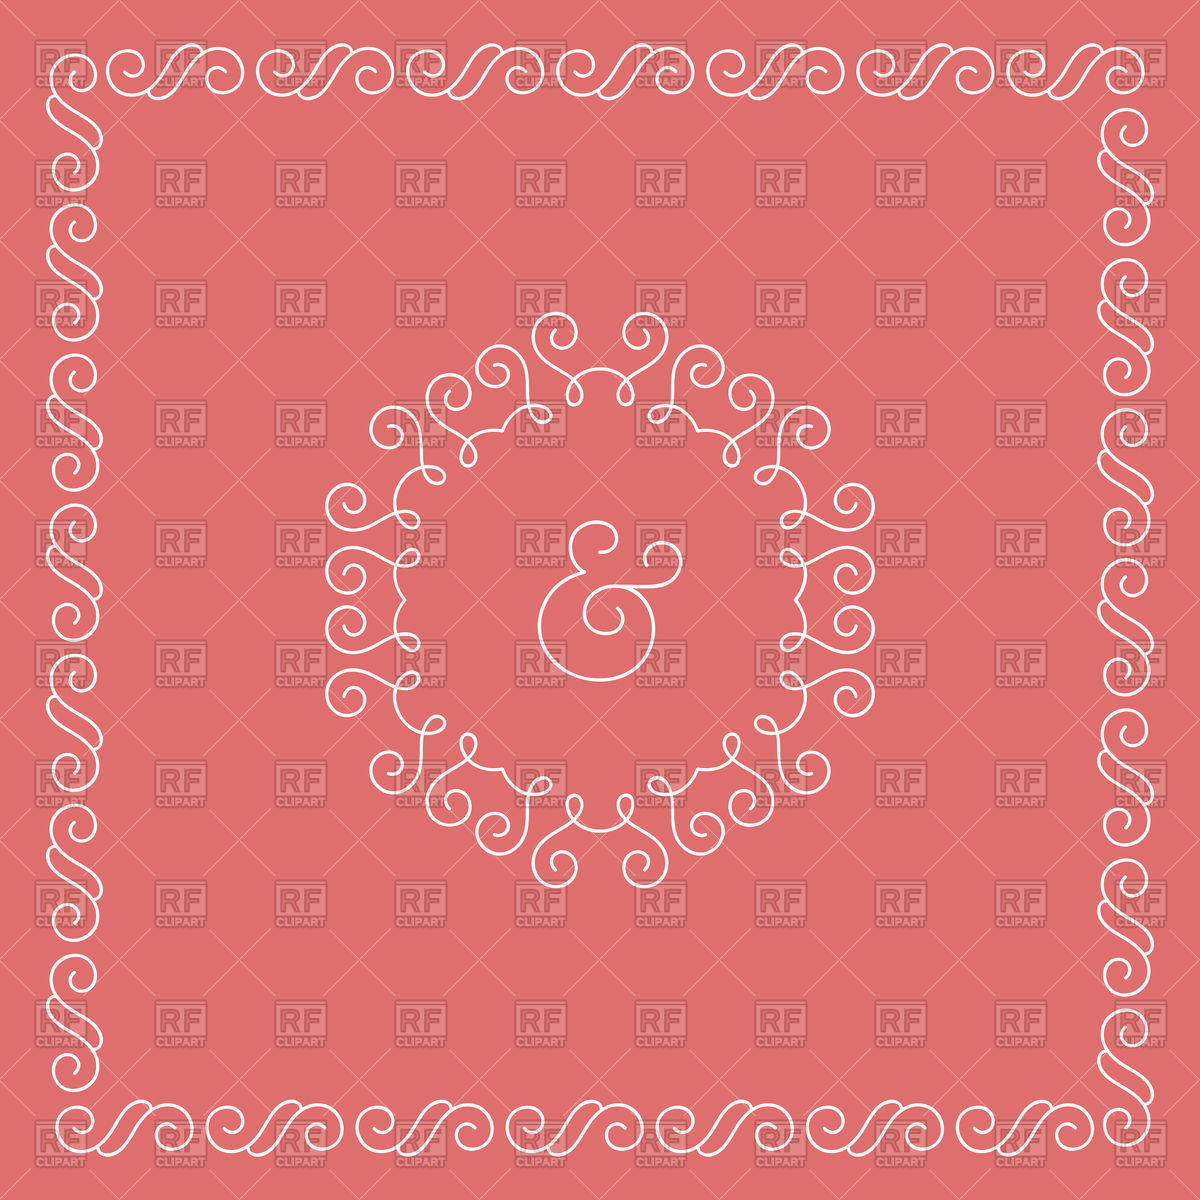 1200x1200 Template Of Wedding Invitation Or Celebrate Card